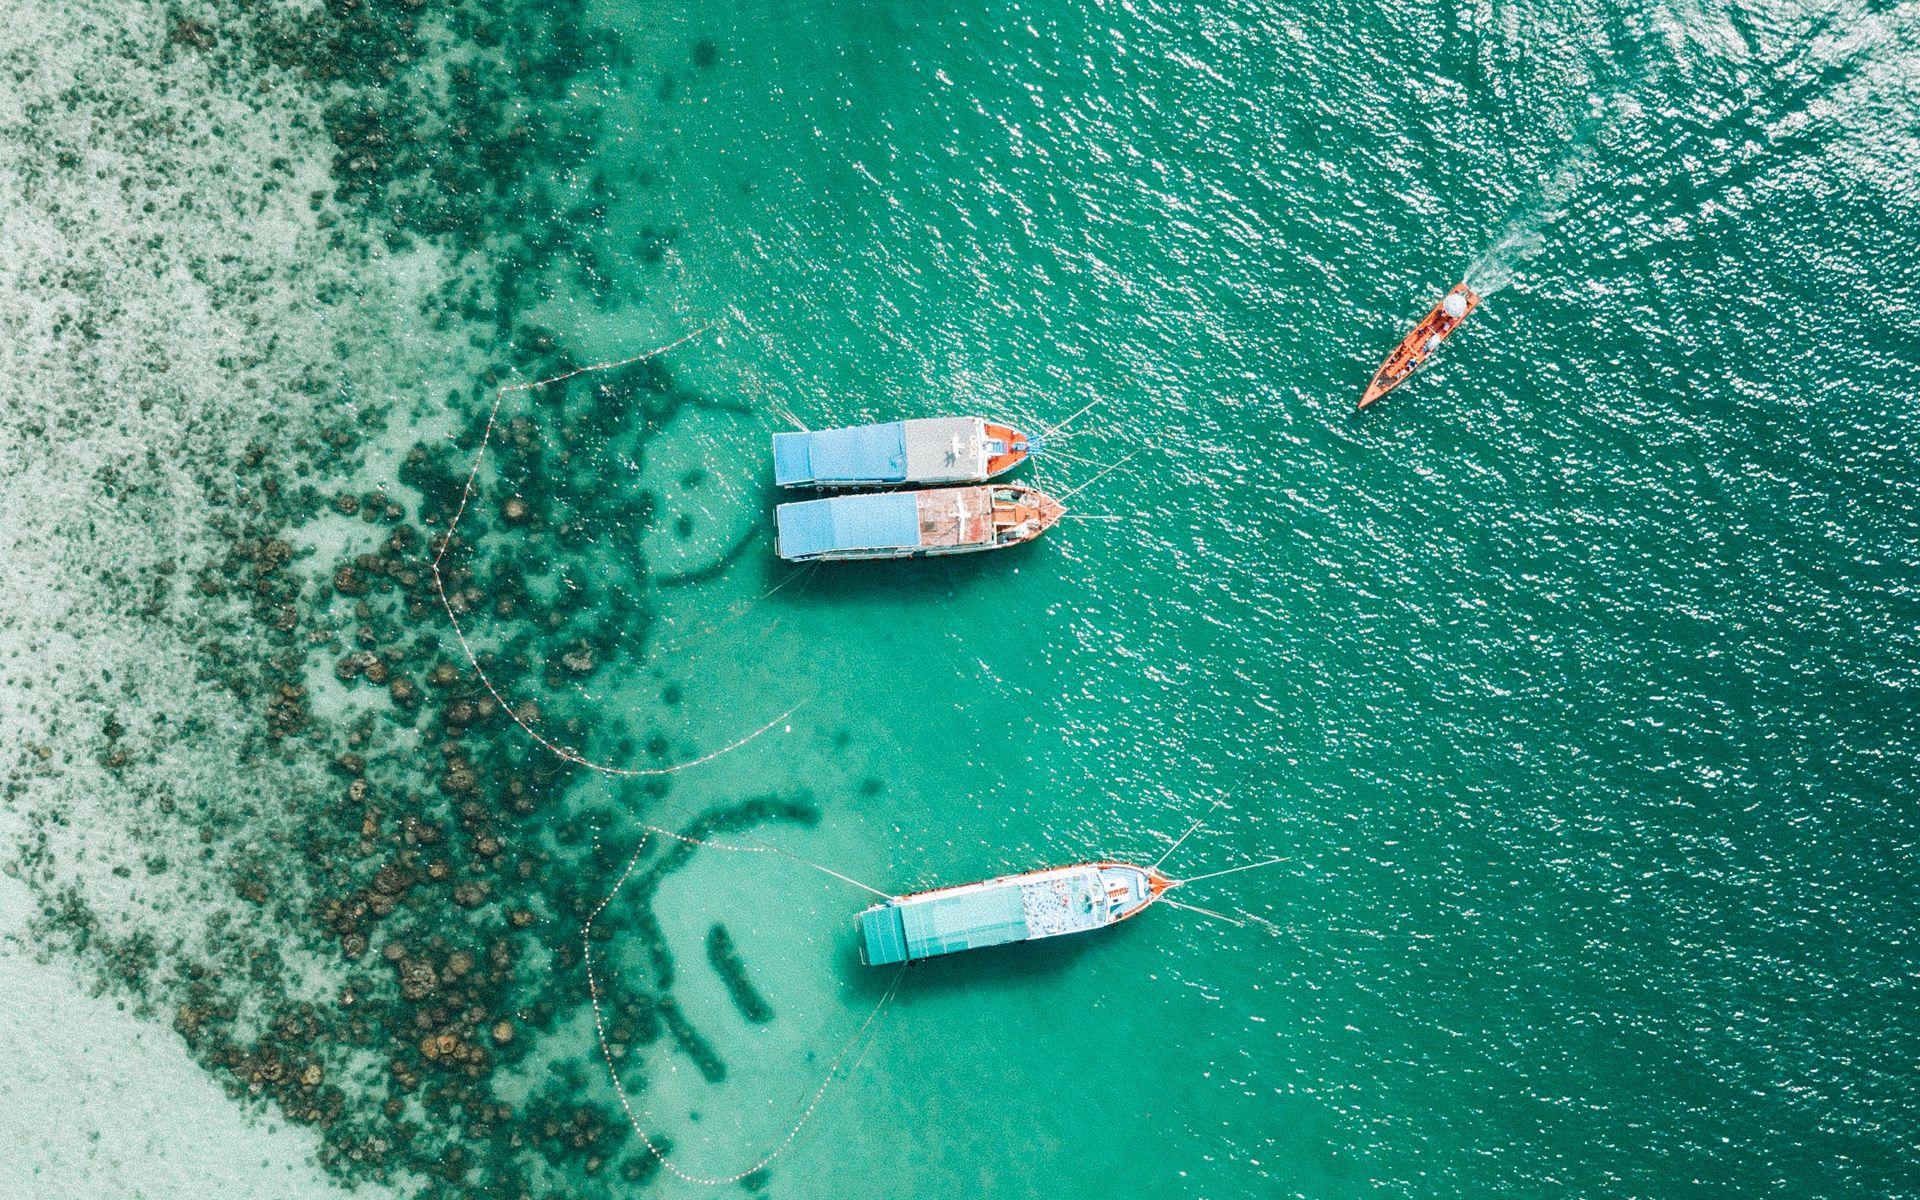 1920x1200 Wallpaper shore, boats, sandbar, ocean, moored, aerial view